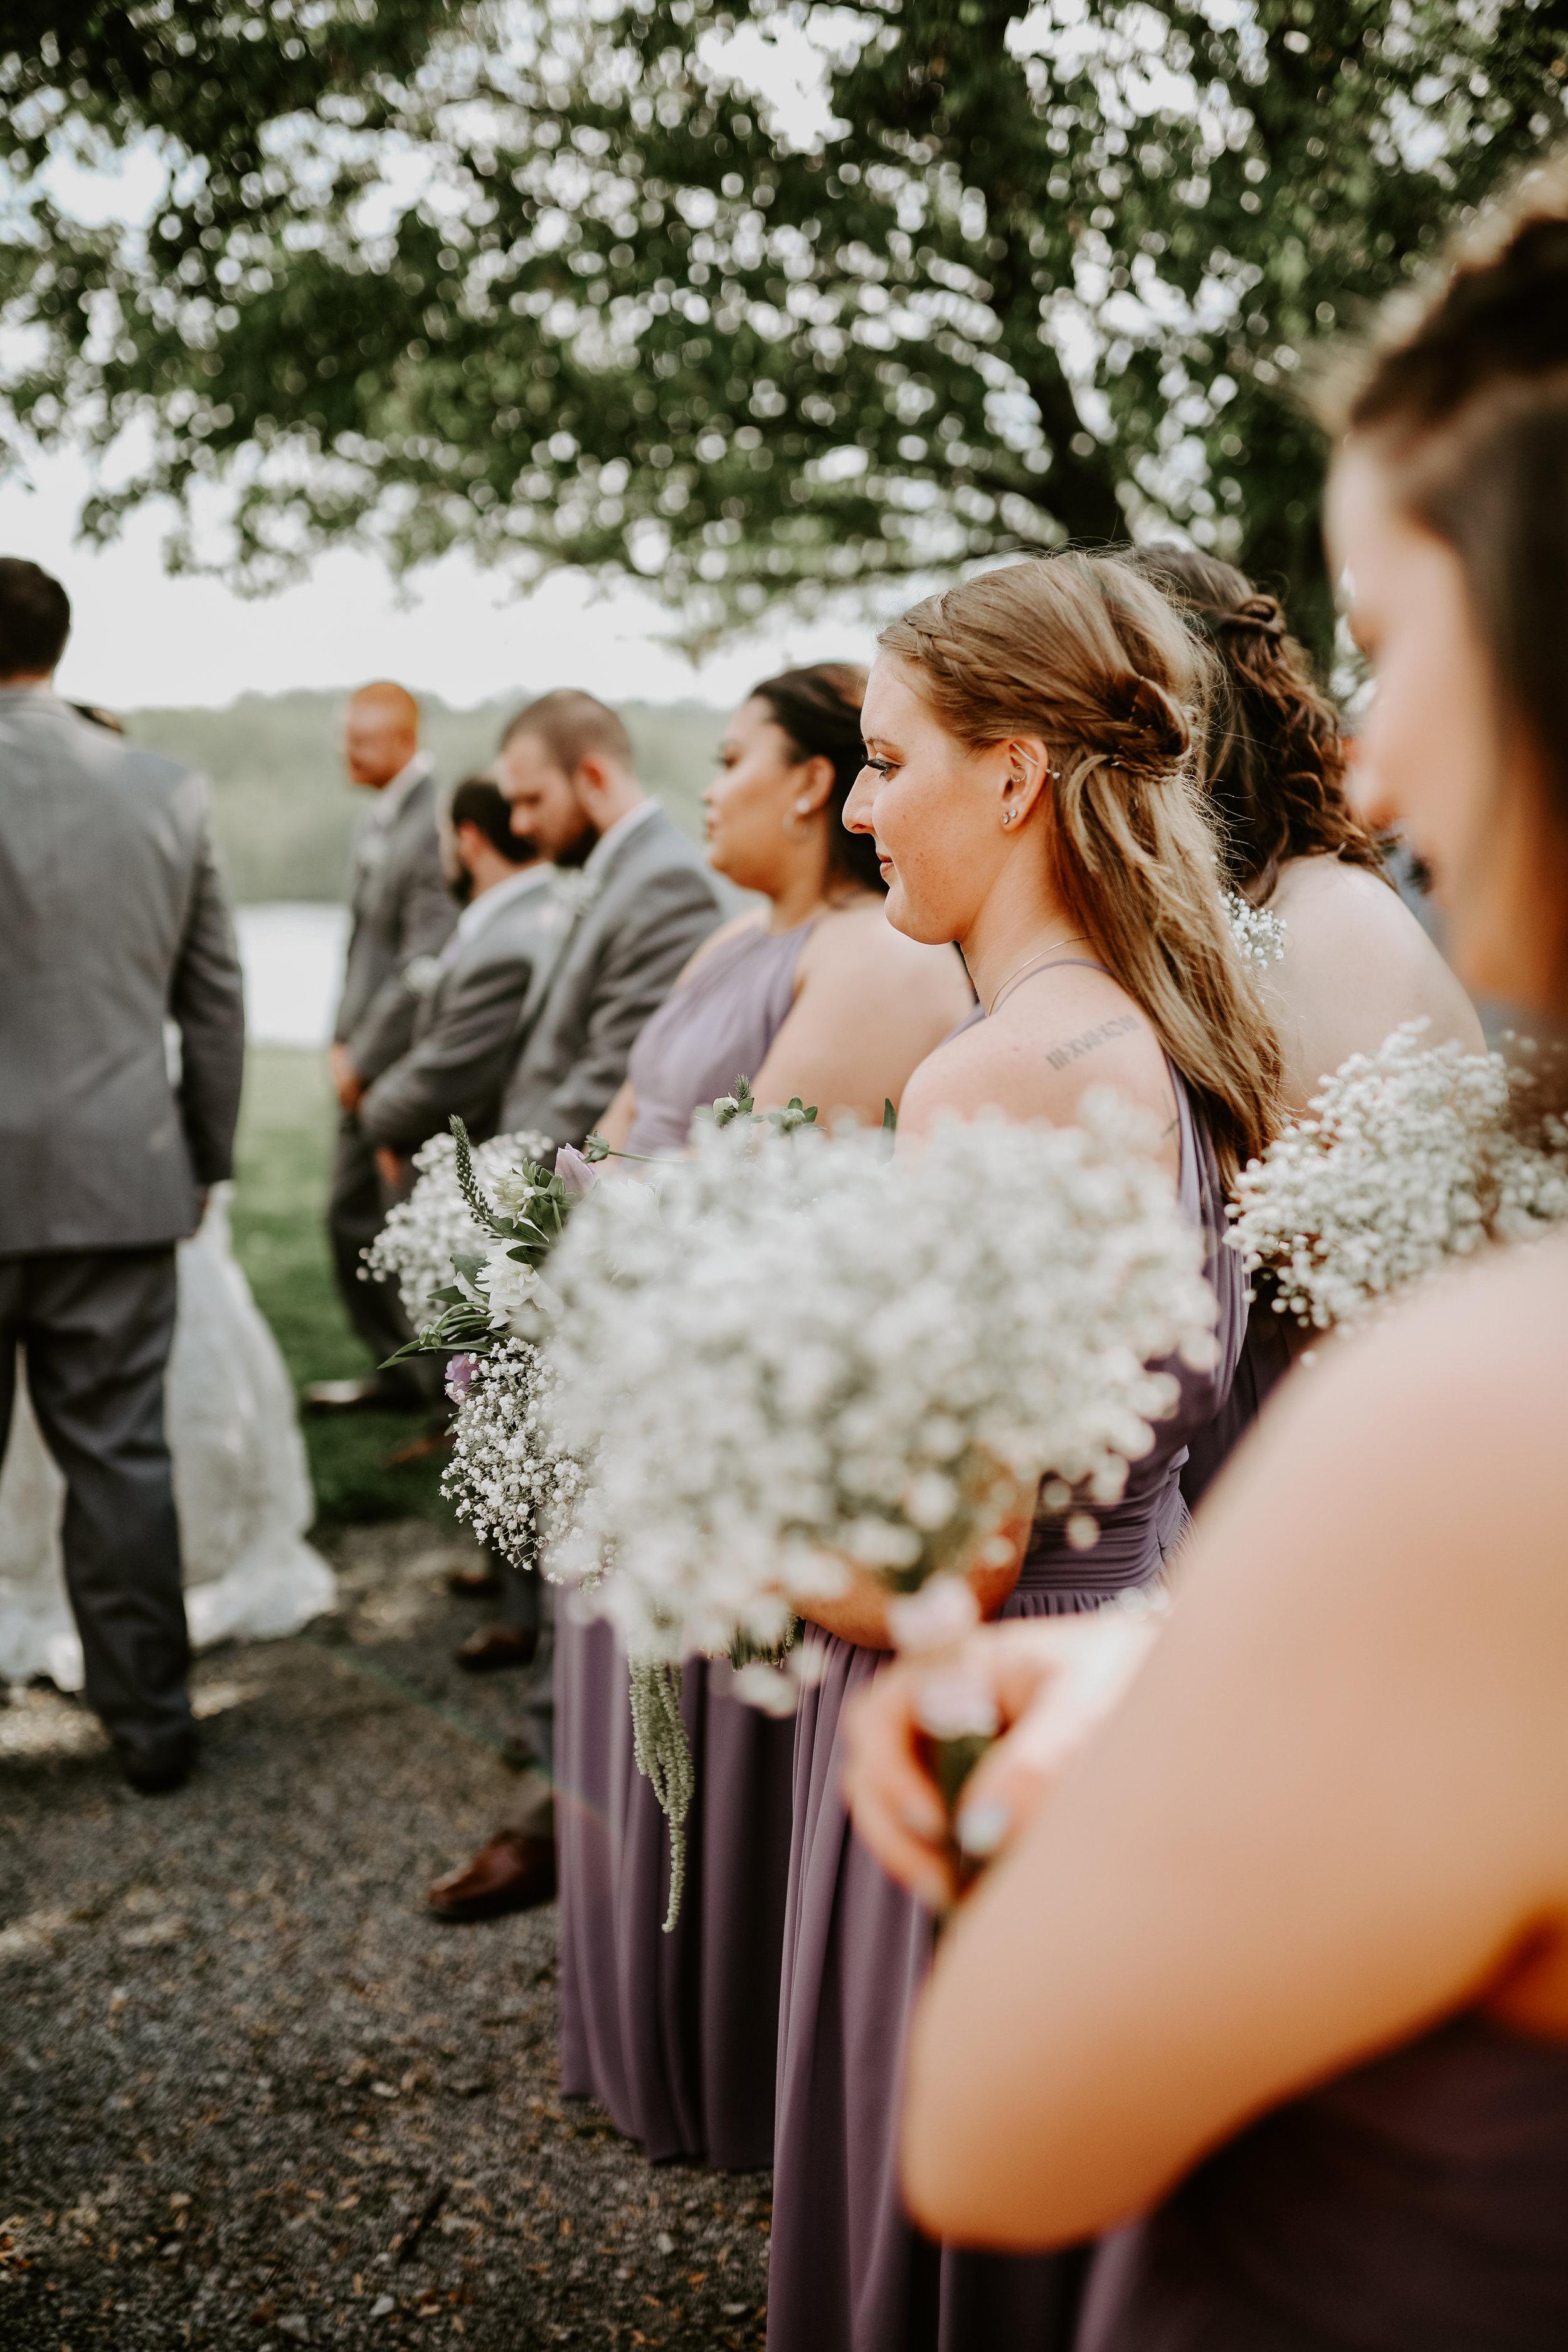 Kylei + Jordan wedding 158 (1 of 1).jpg